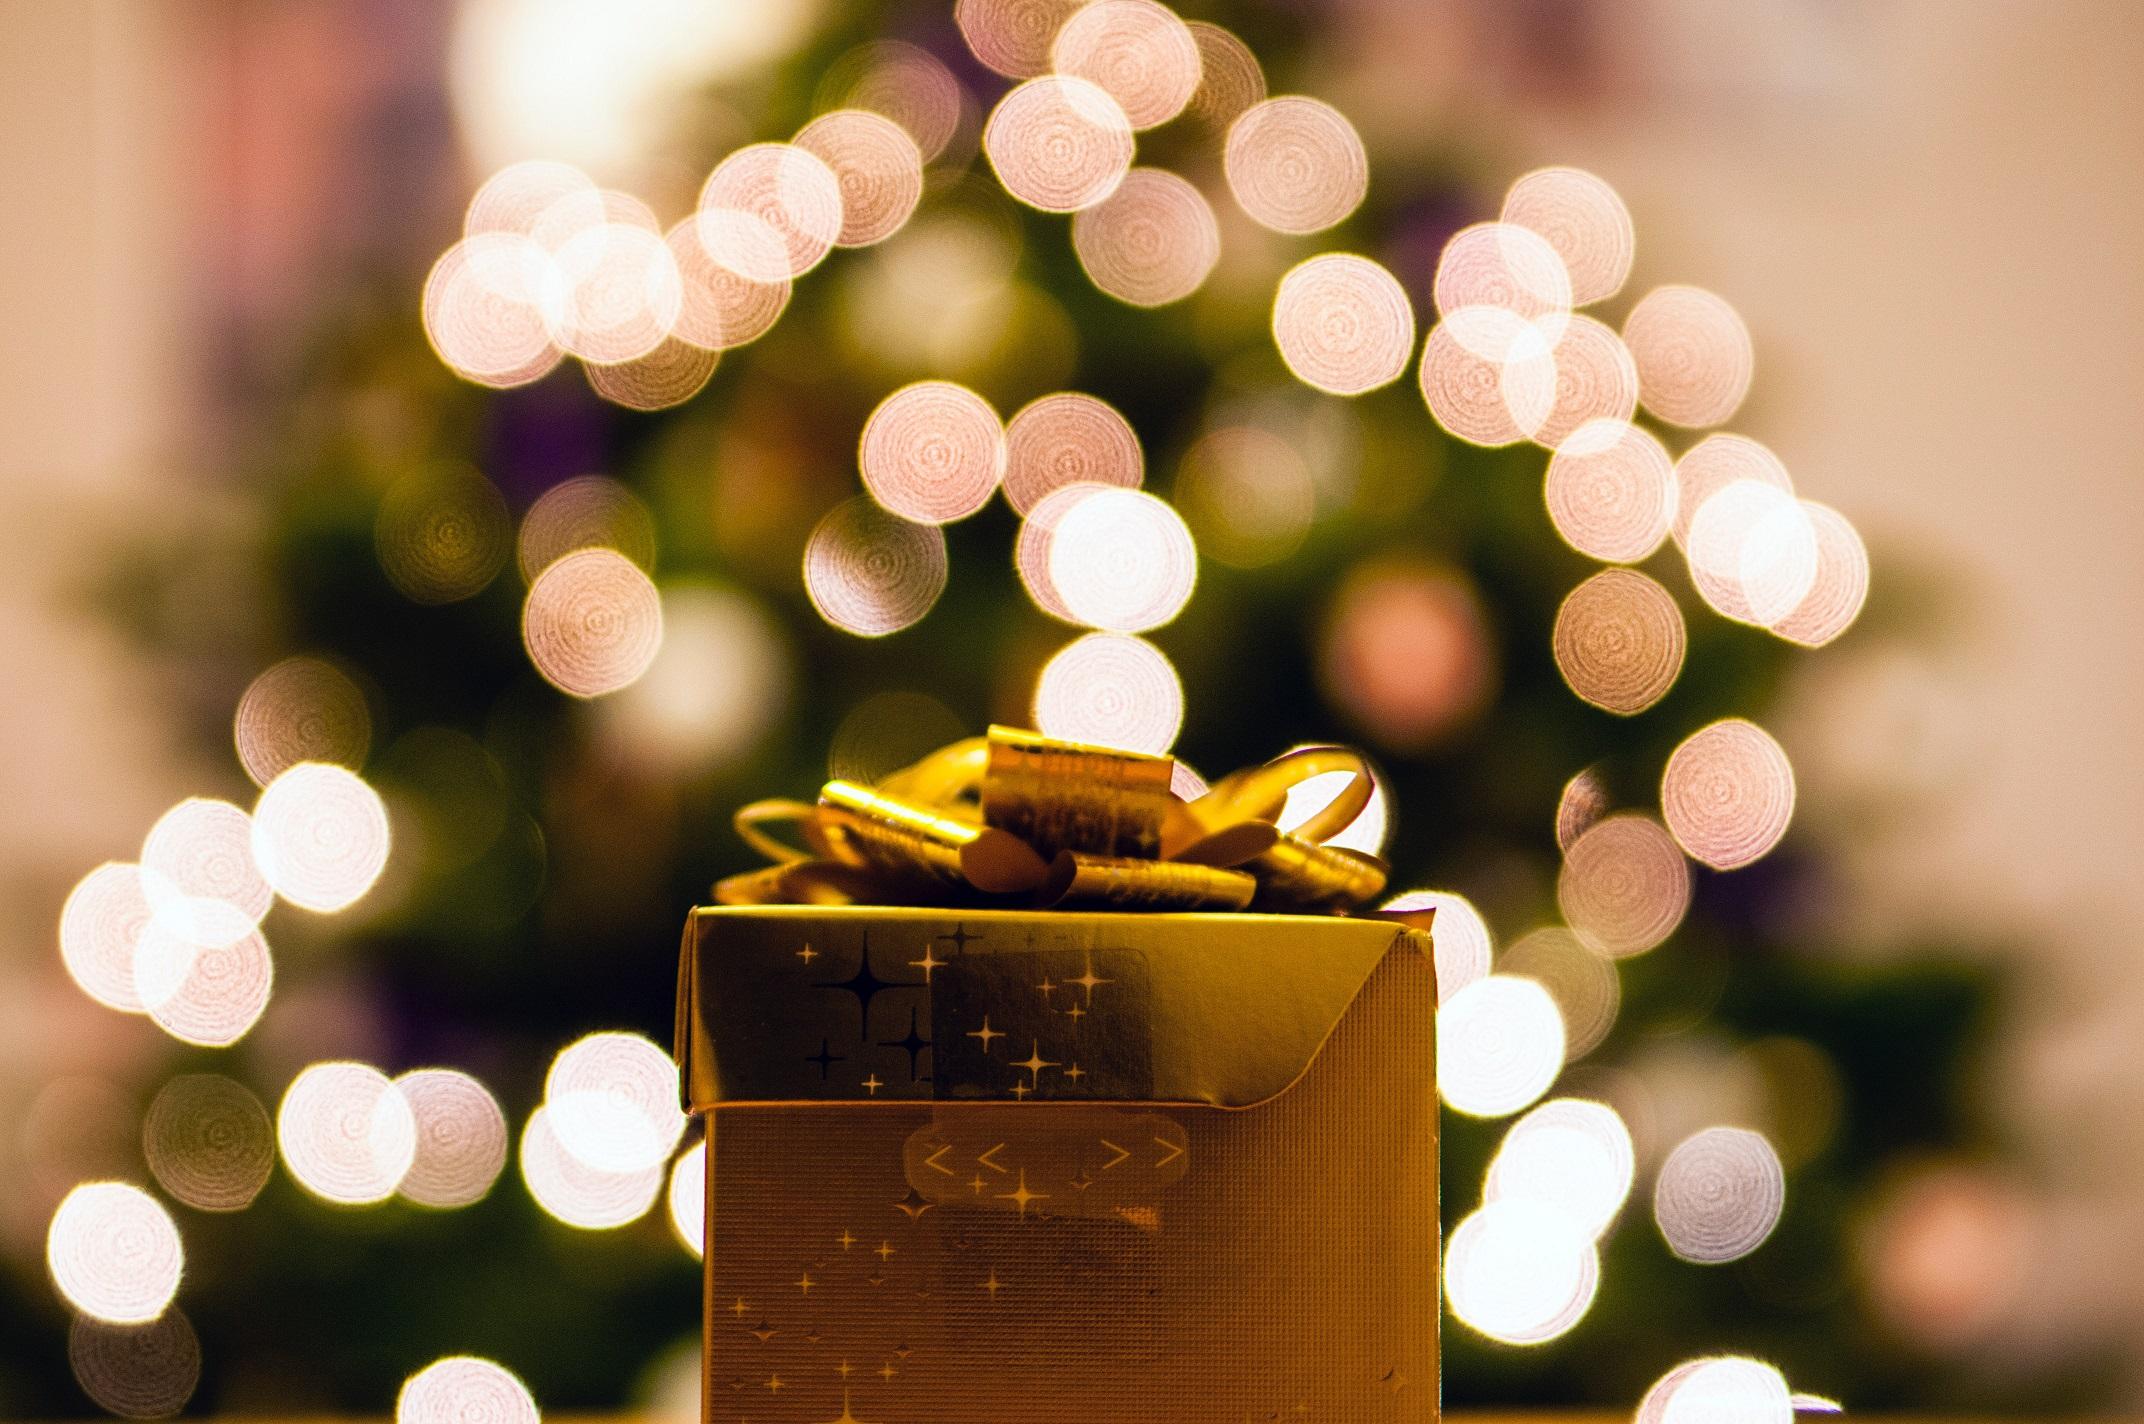 eco-friendly holiday gift ideas